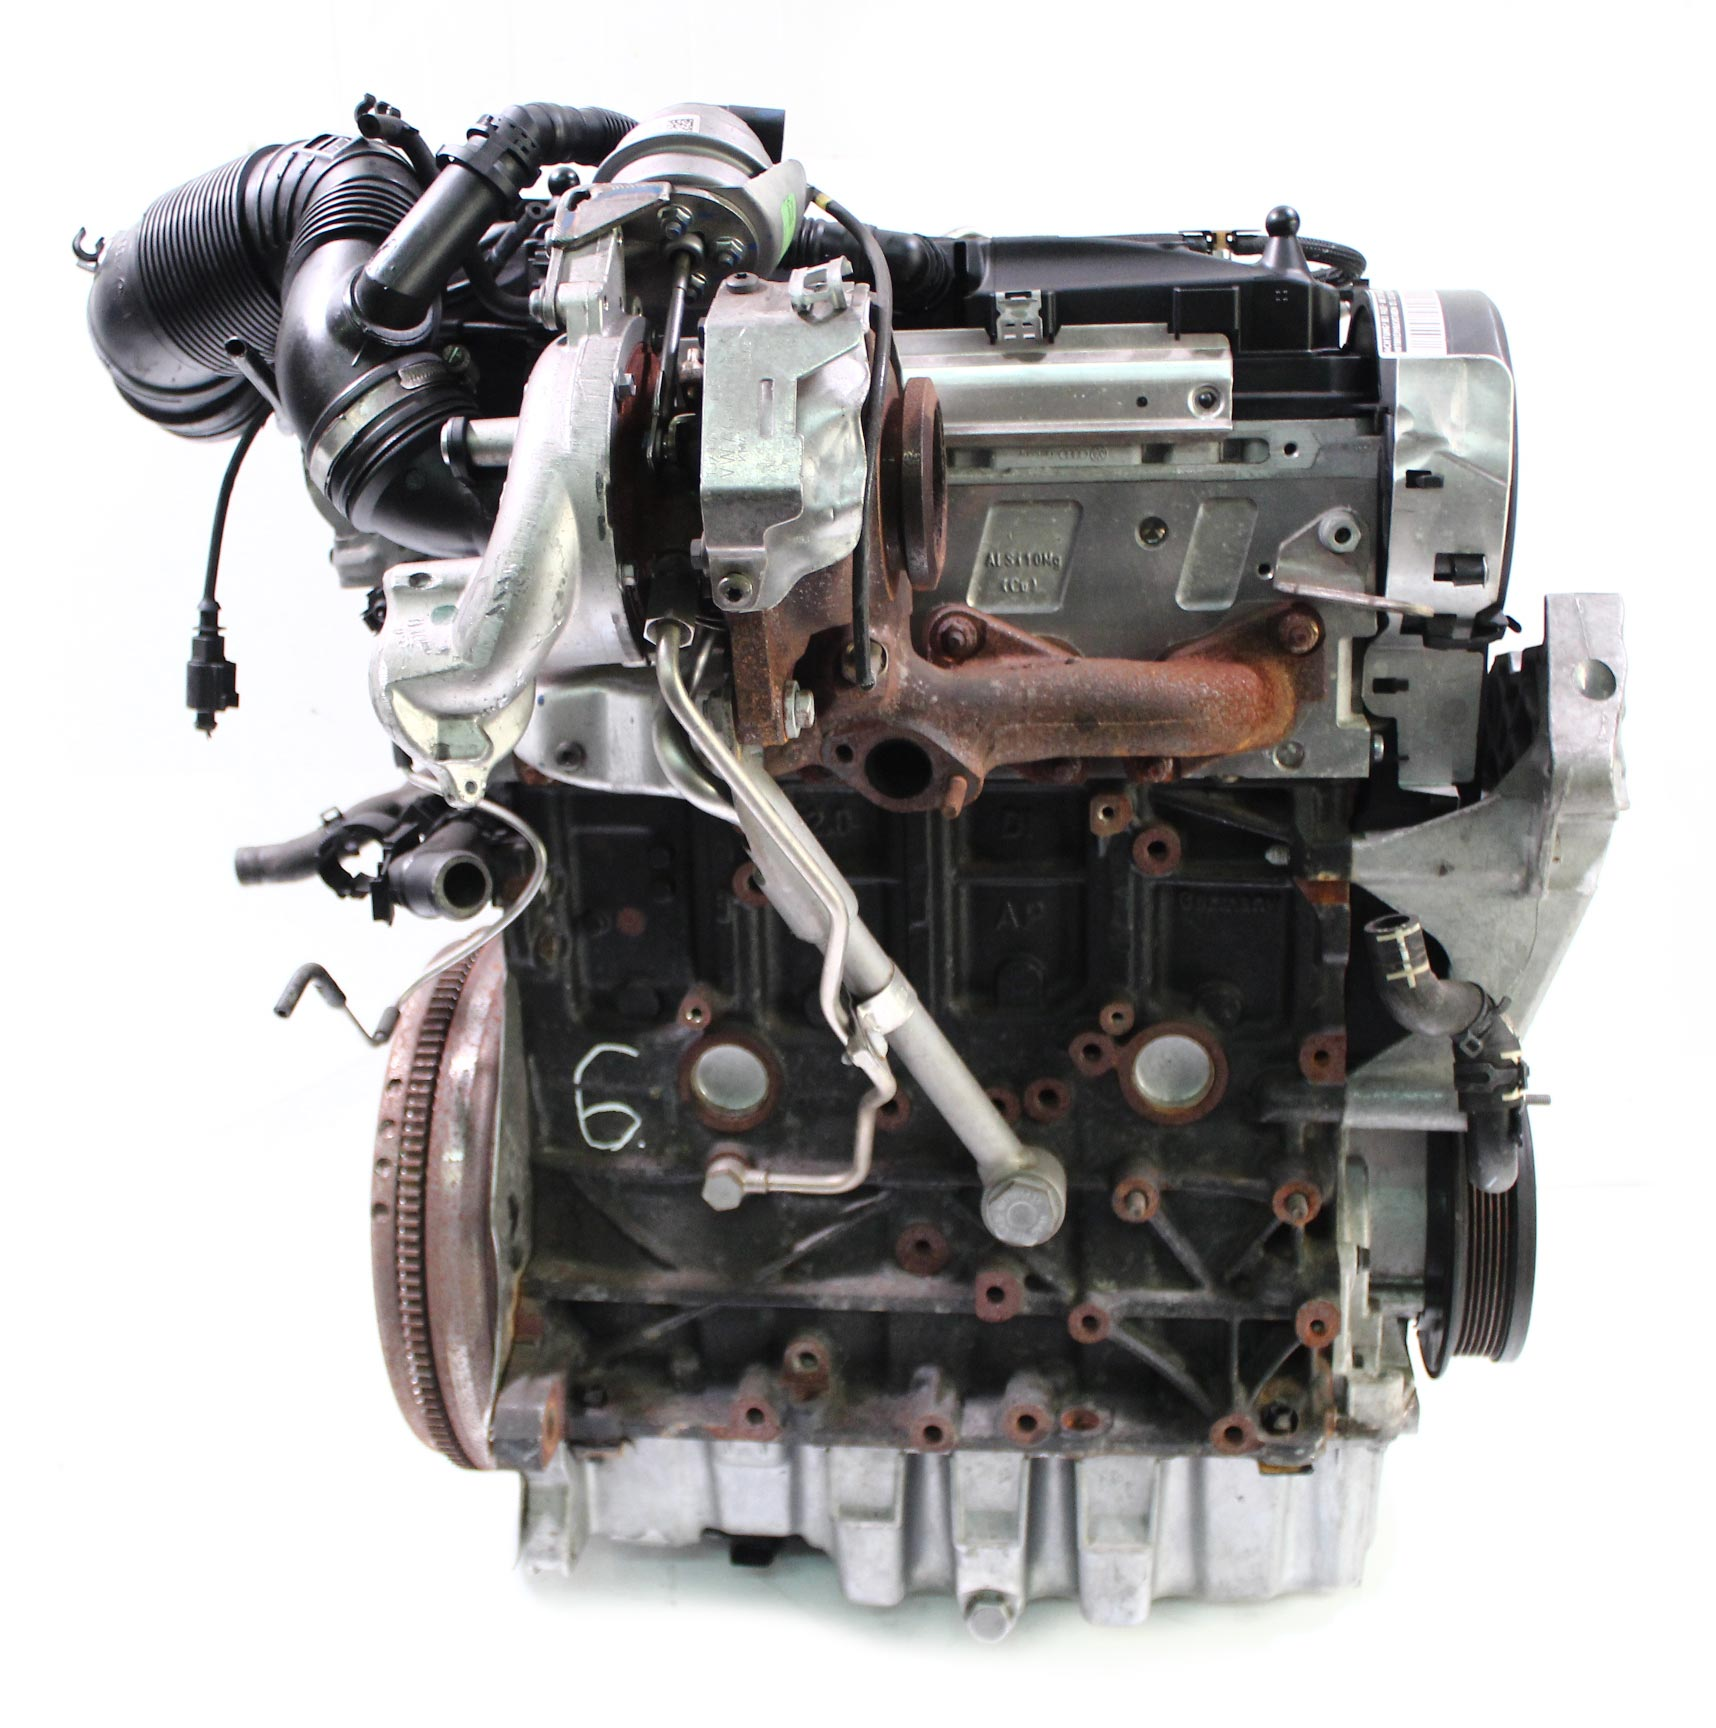 Motor 2013 Seat Skoda VW Leon Altea Yeti Caddy Touran 2,0 TDI Diesel CFJ CFJA